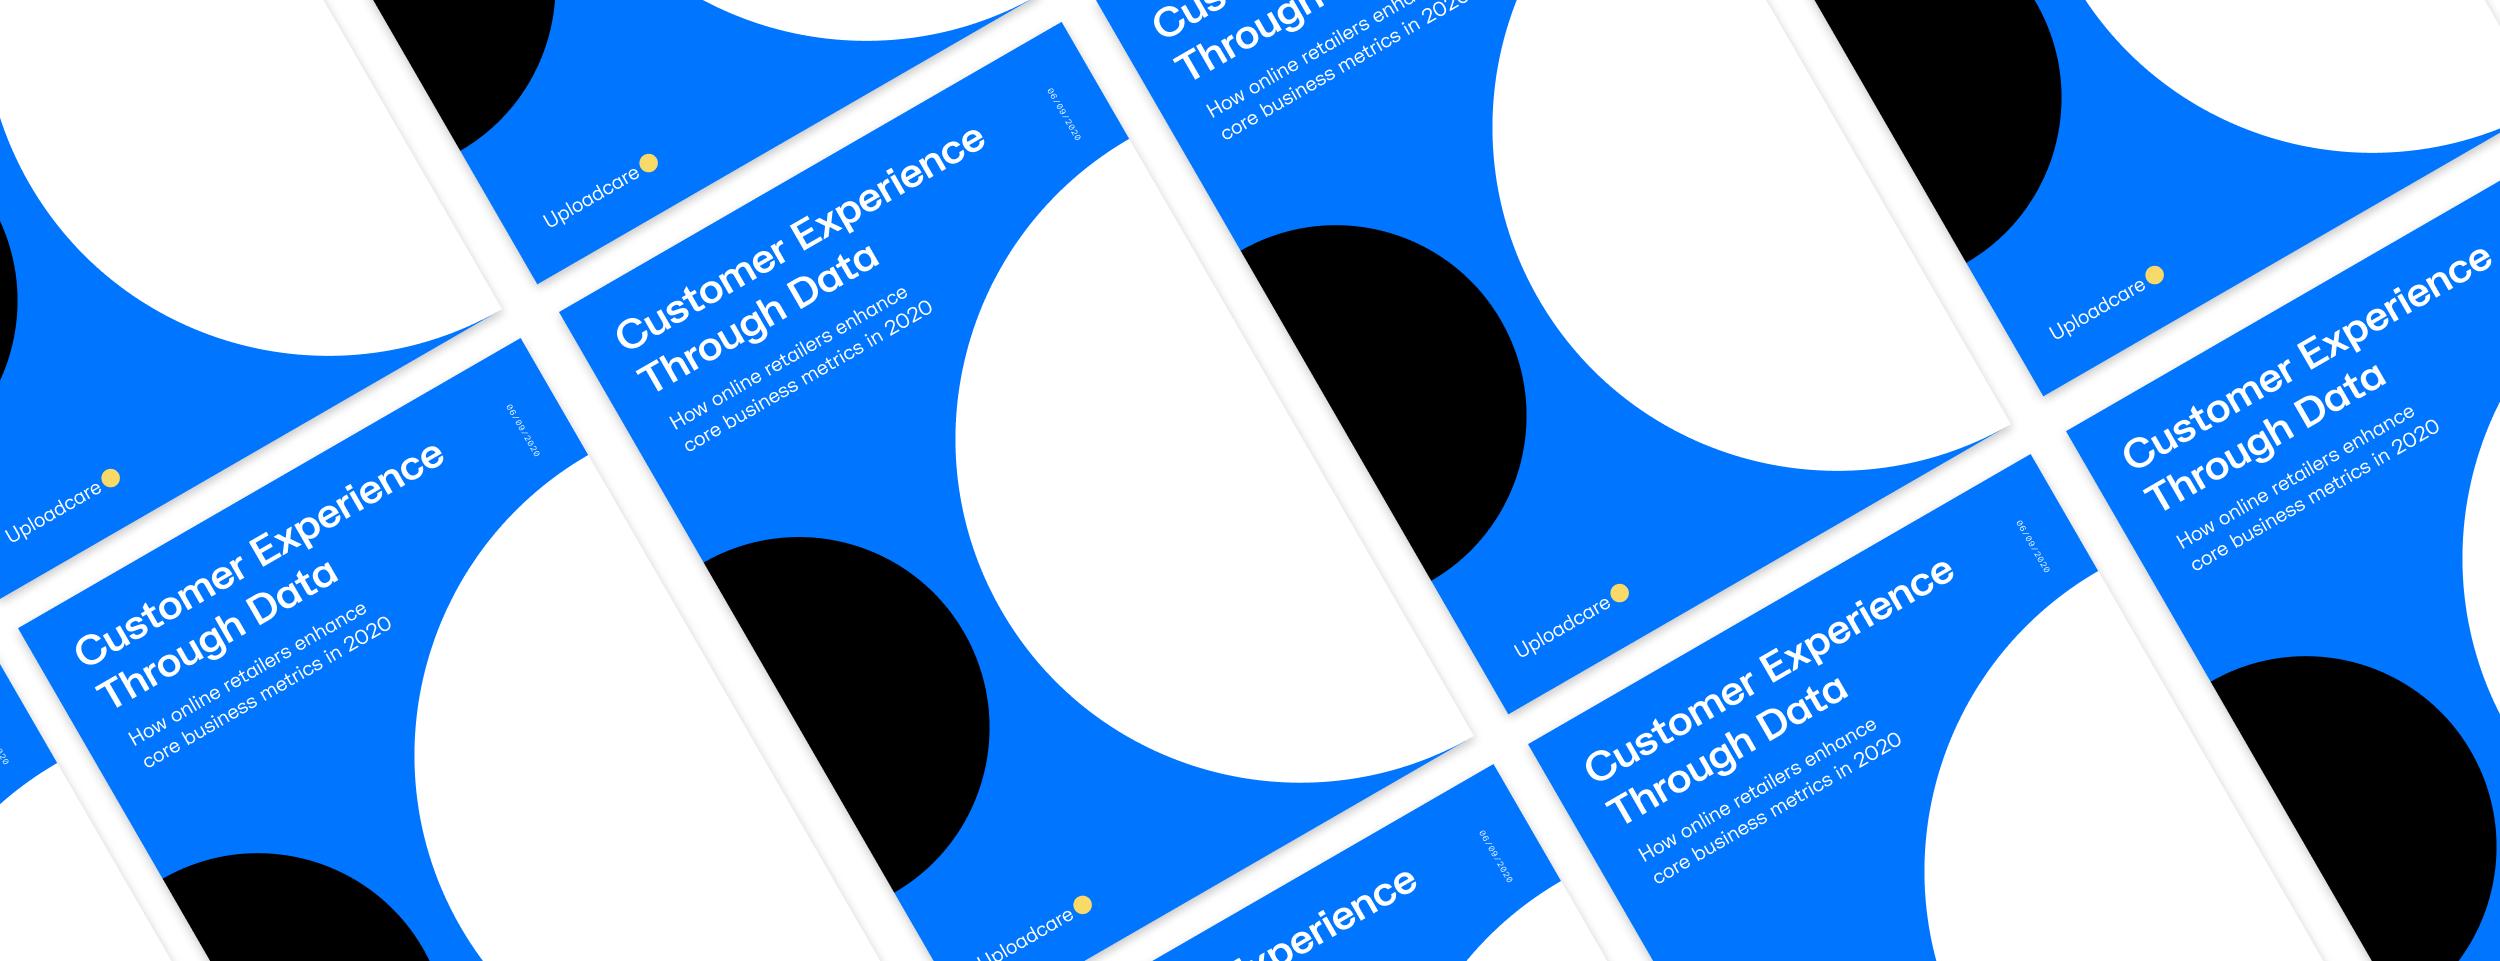 customer experience through data